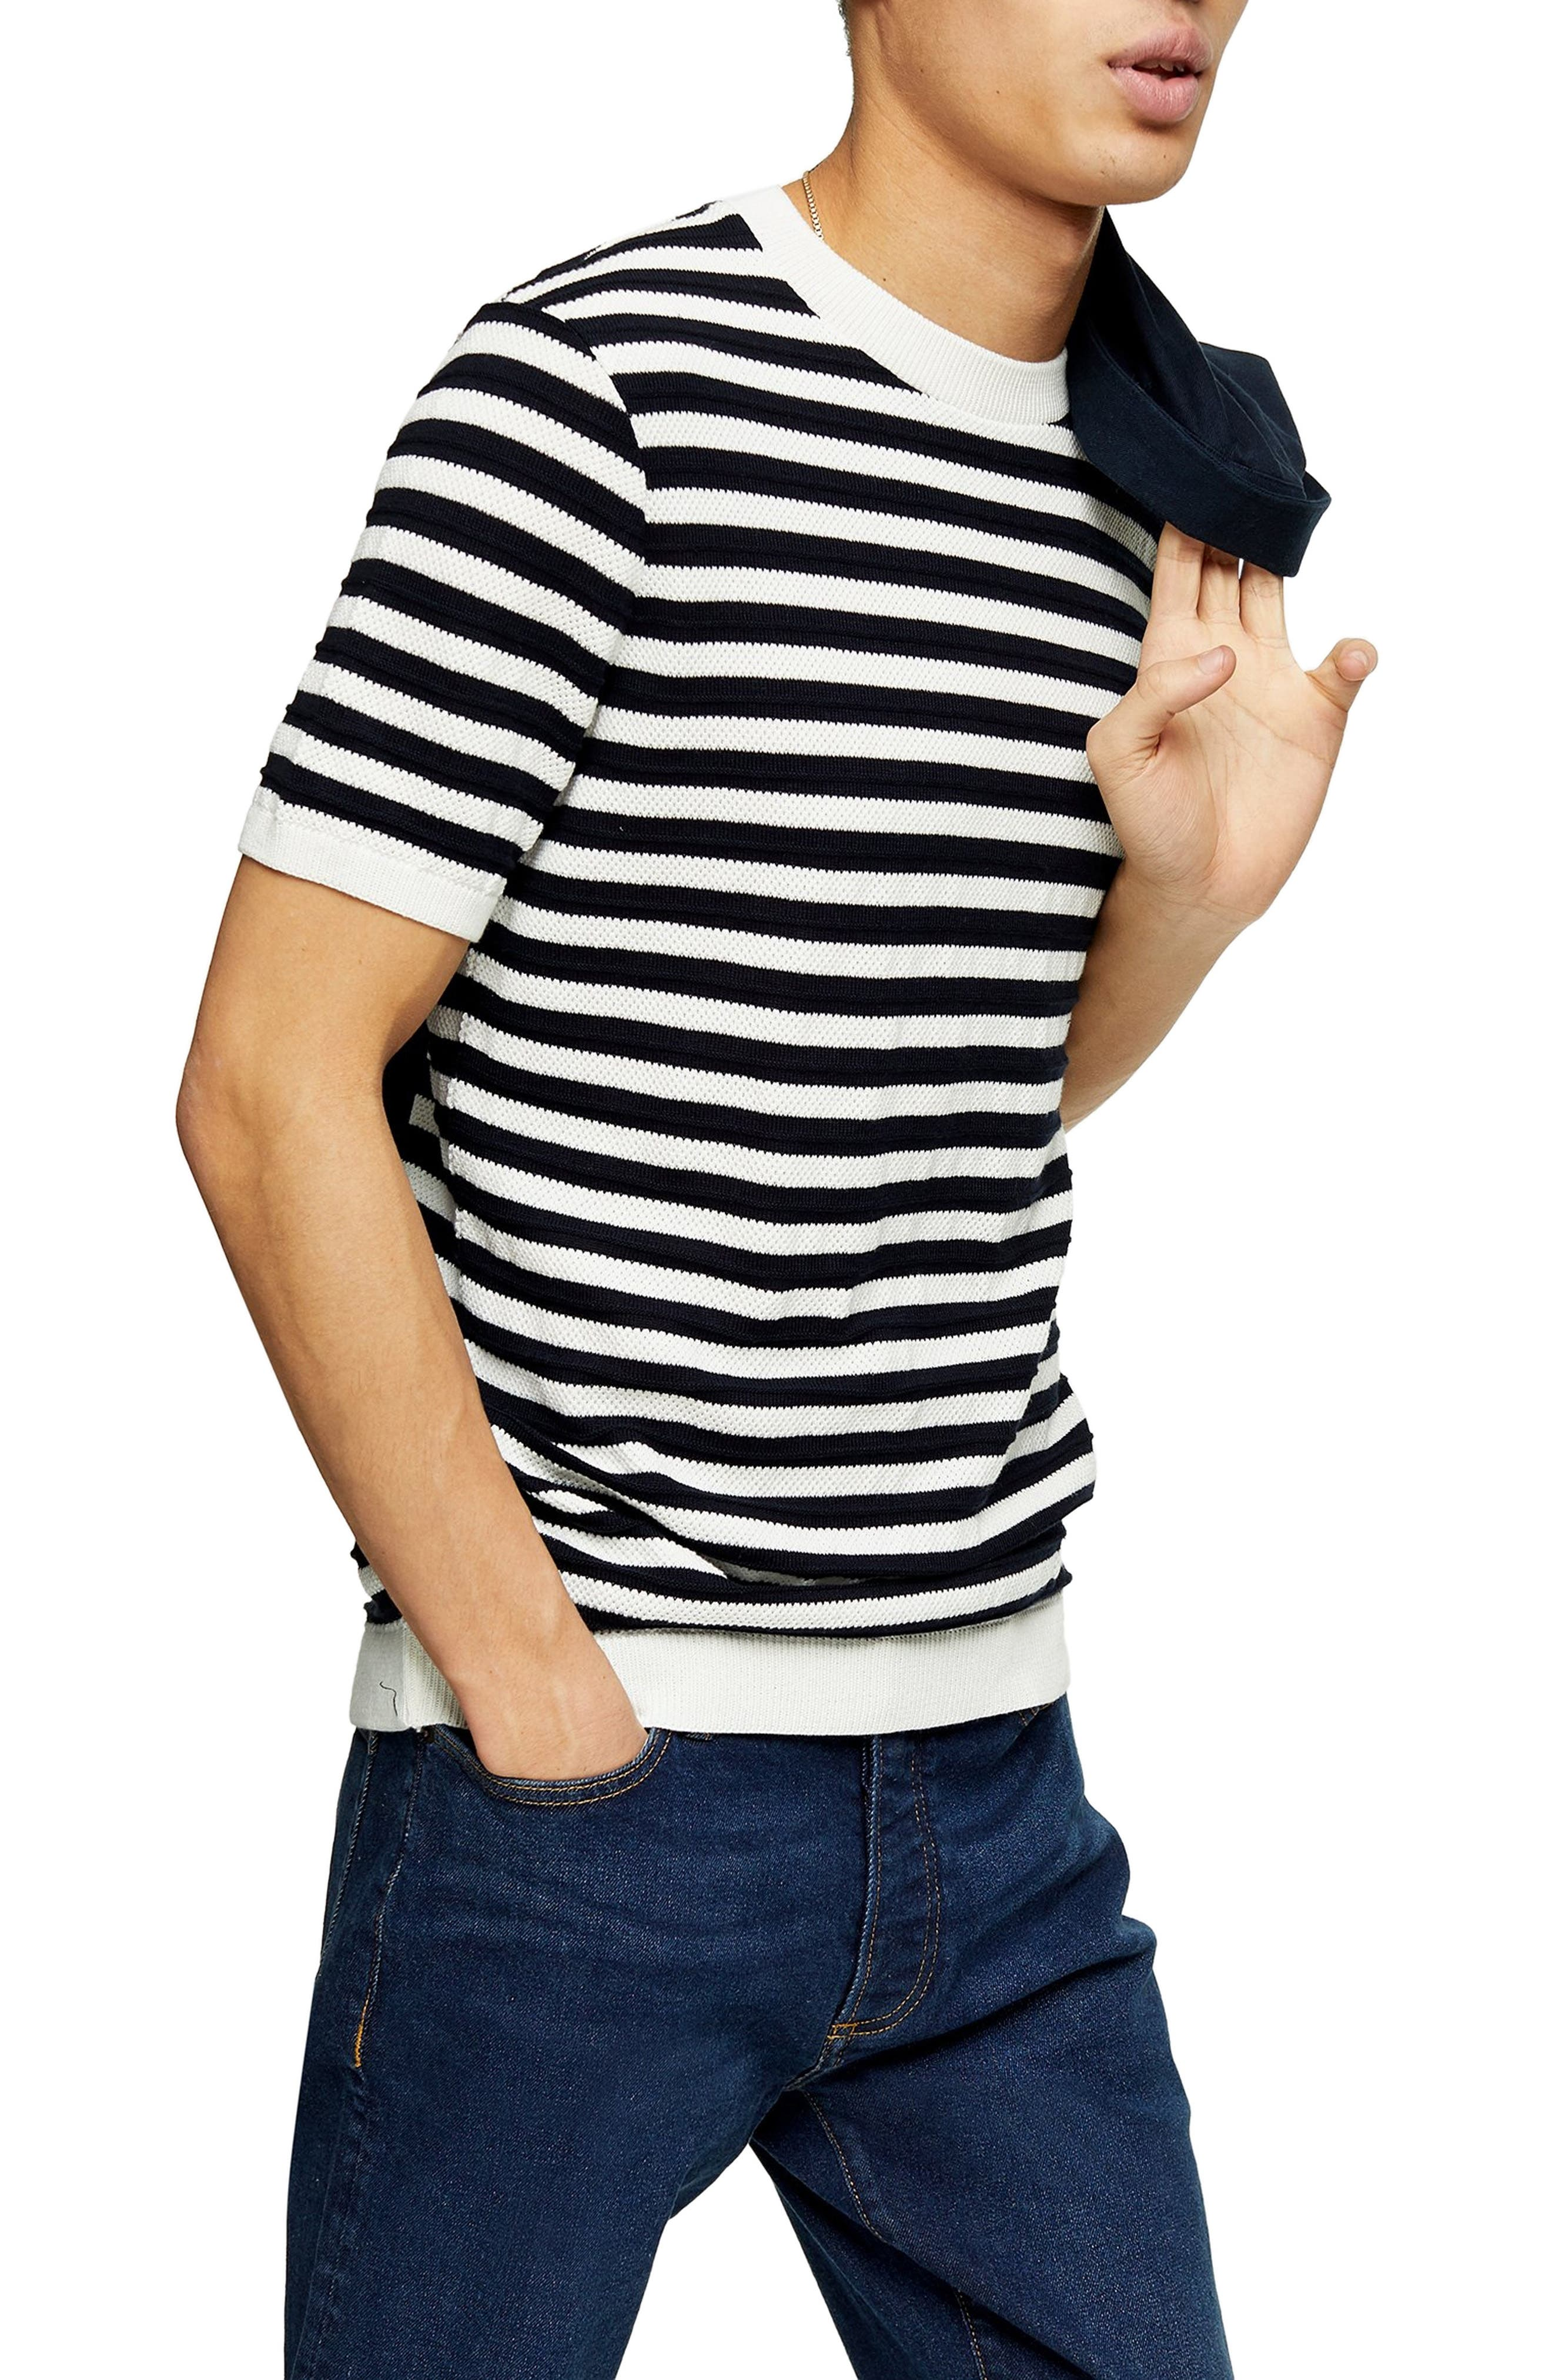 Mens Vintage Shirts – Retro Shirts Mens Topman Stripe Knit T-Shirt $27.00 AT vintagedancer.com